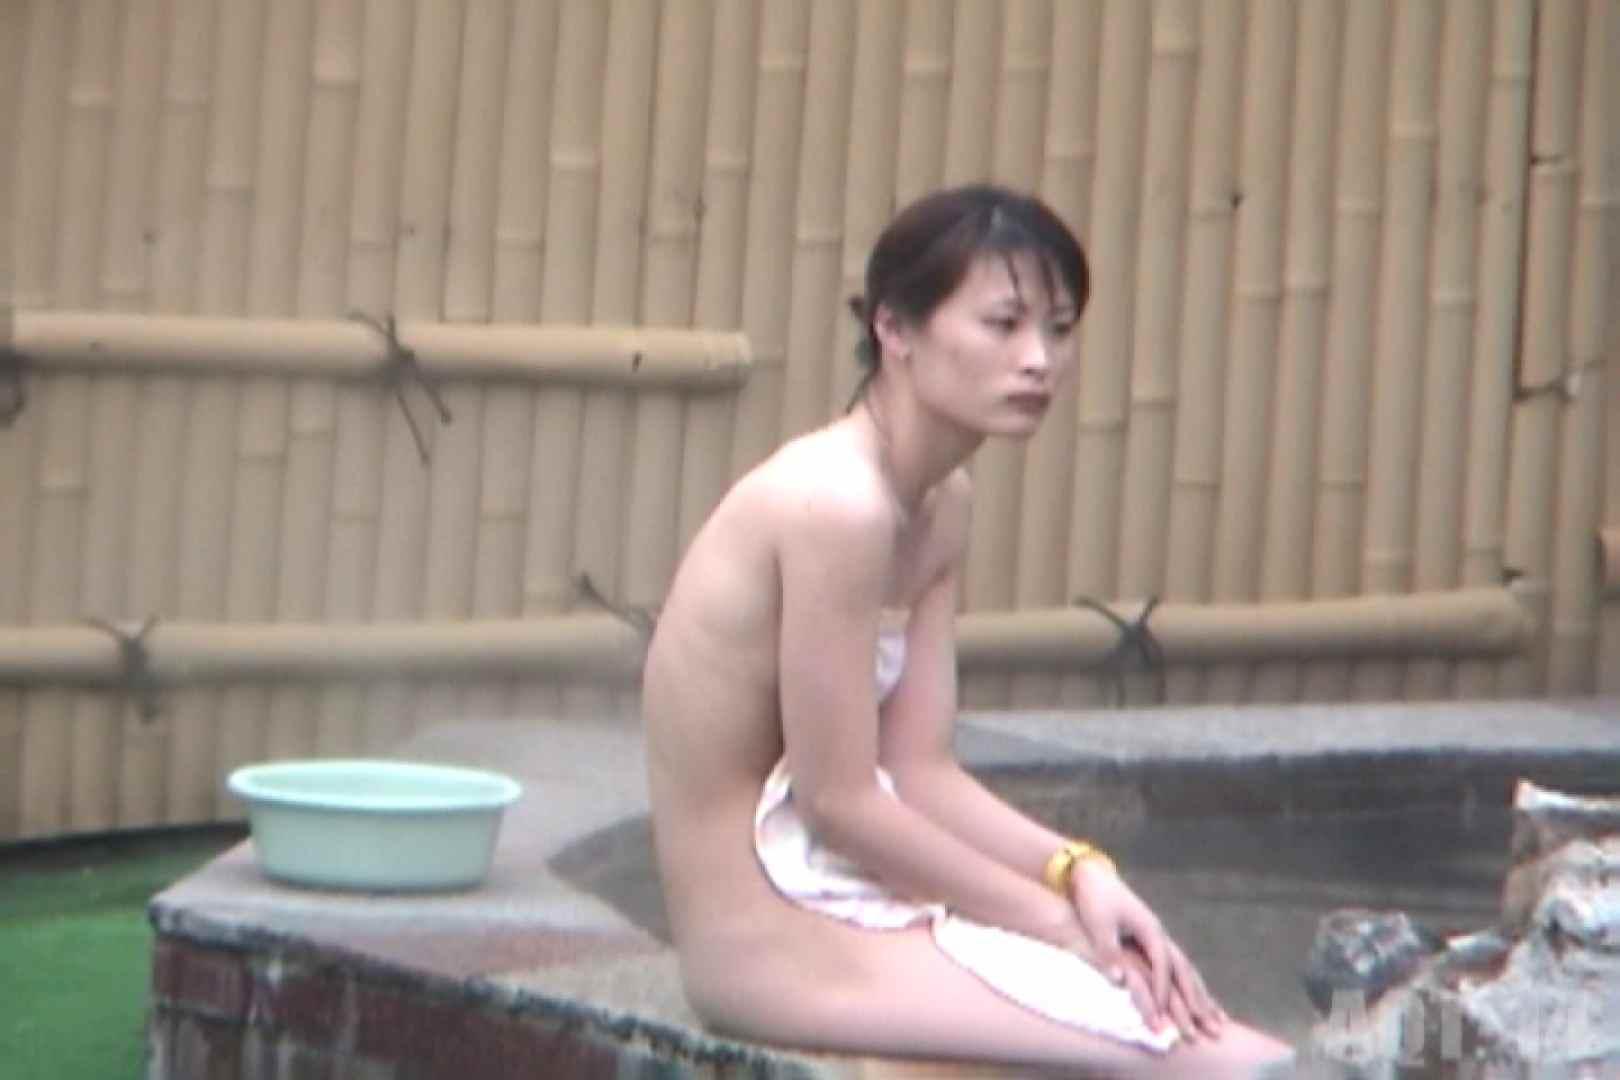 Aquaな露天風呂Vol.822 露天 すけべAV動画紹介 98連発 55